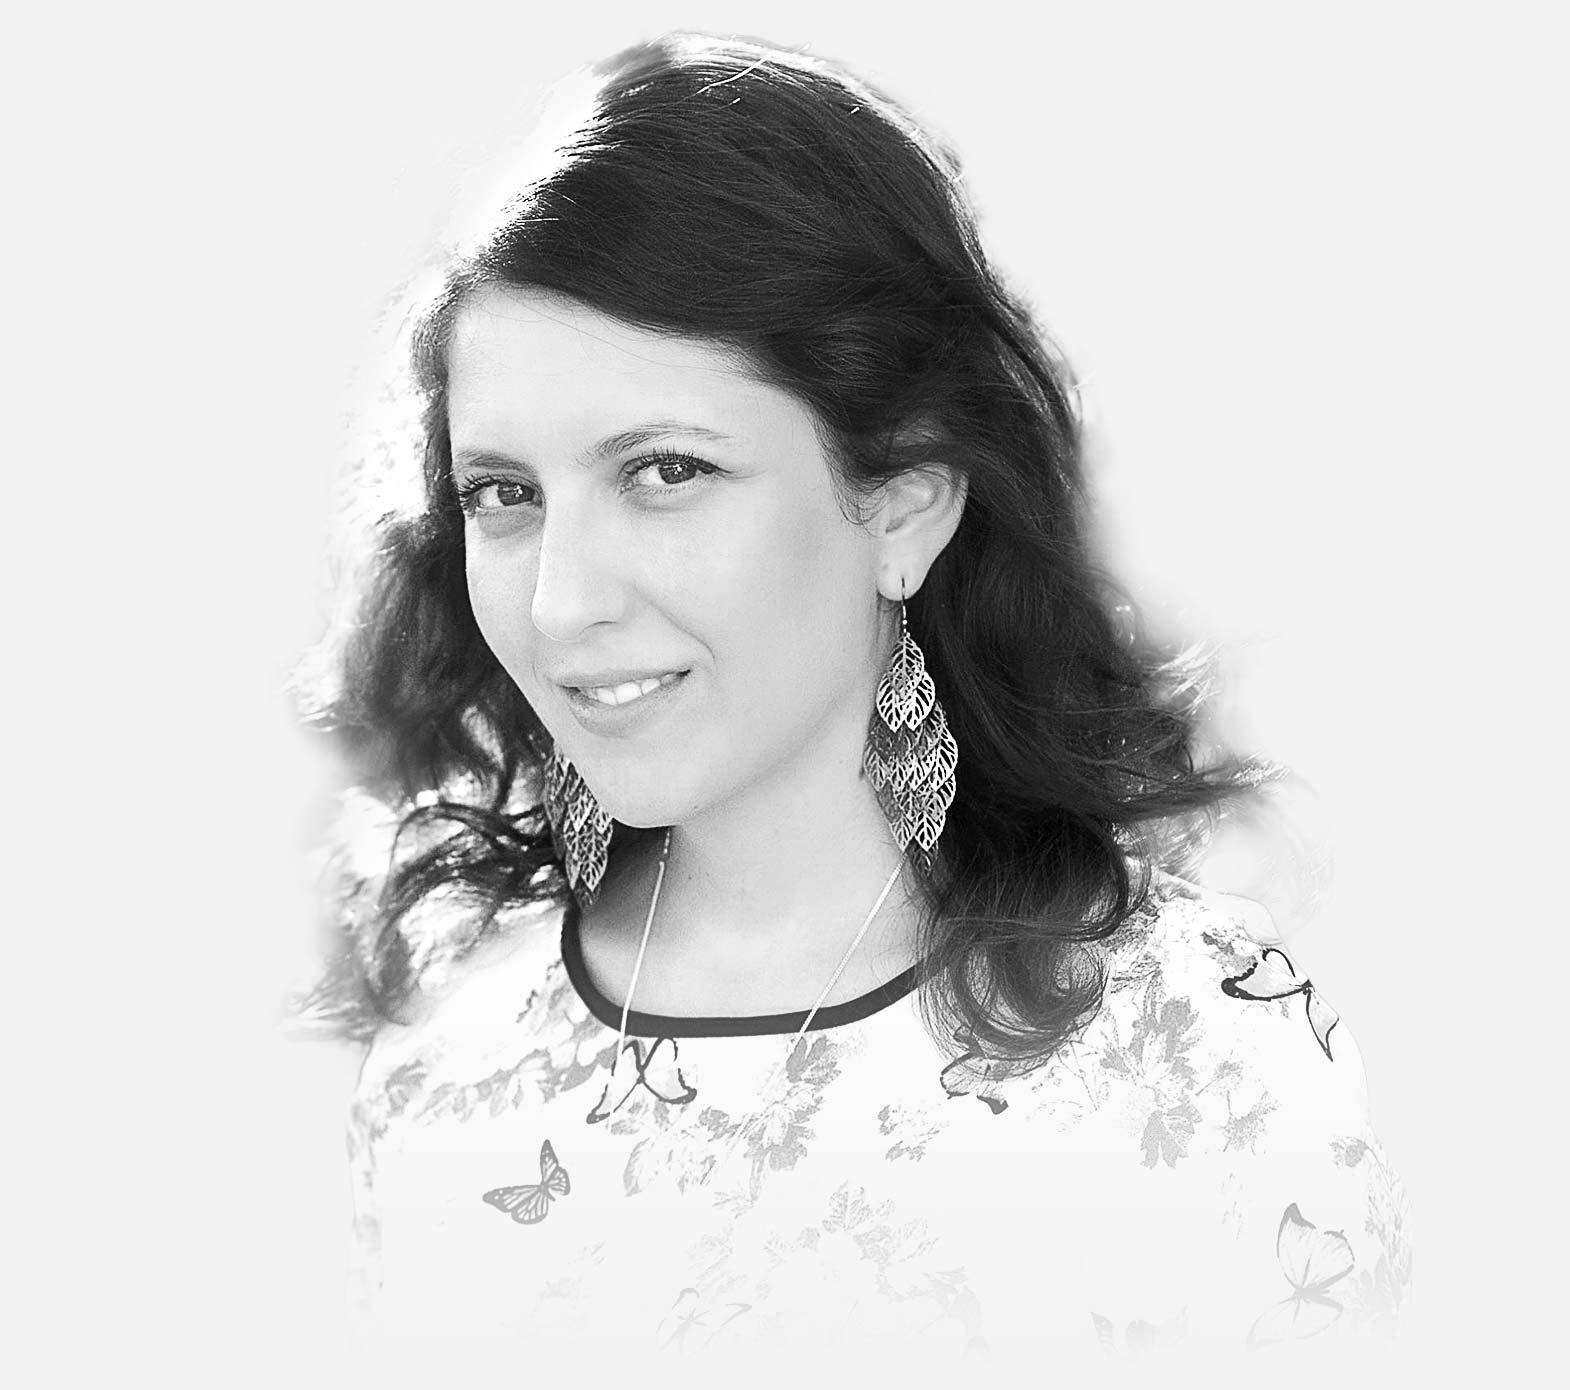 Portrait of Anna Axenov